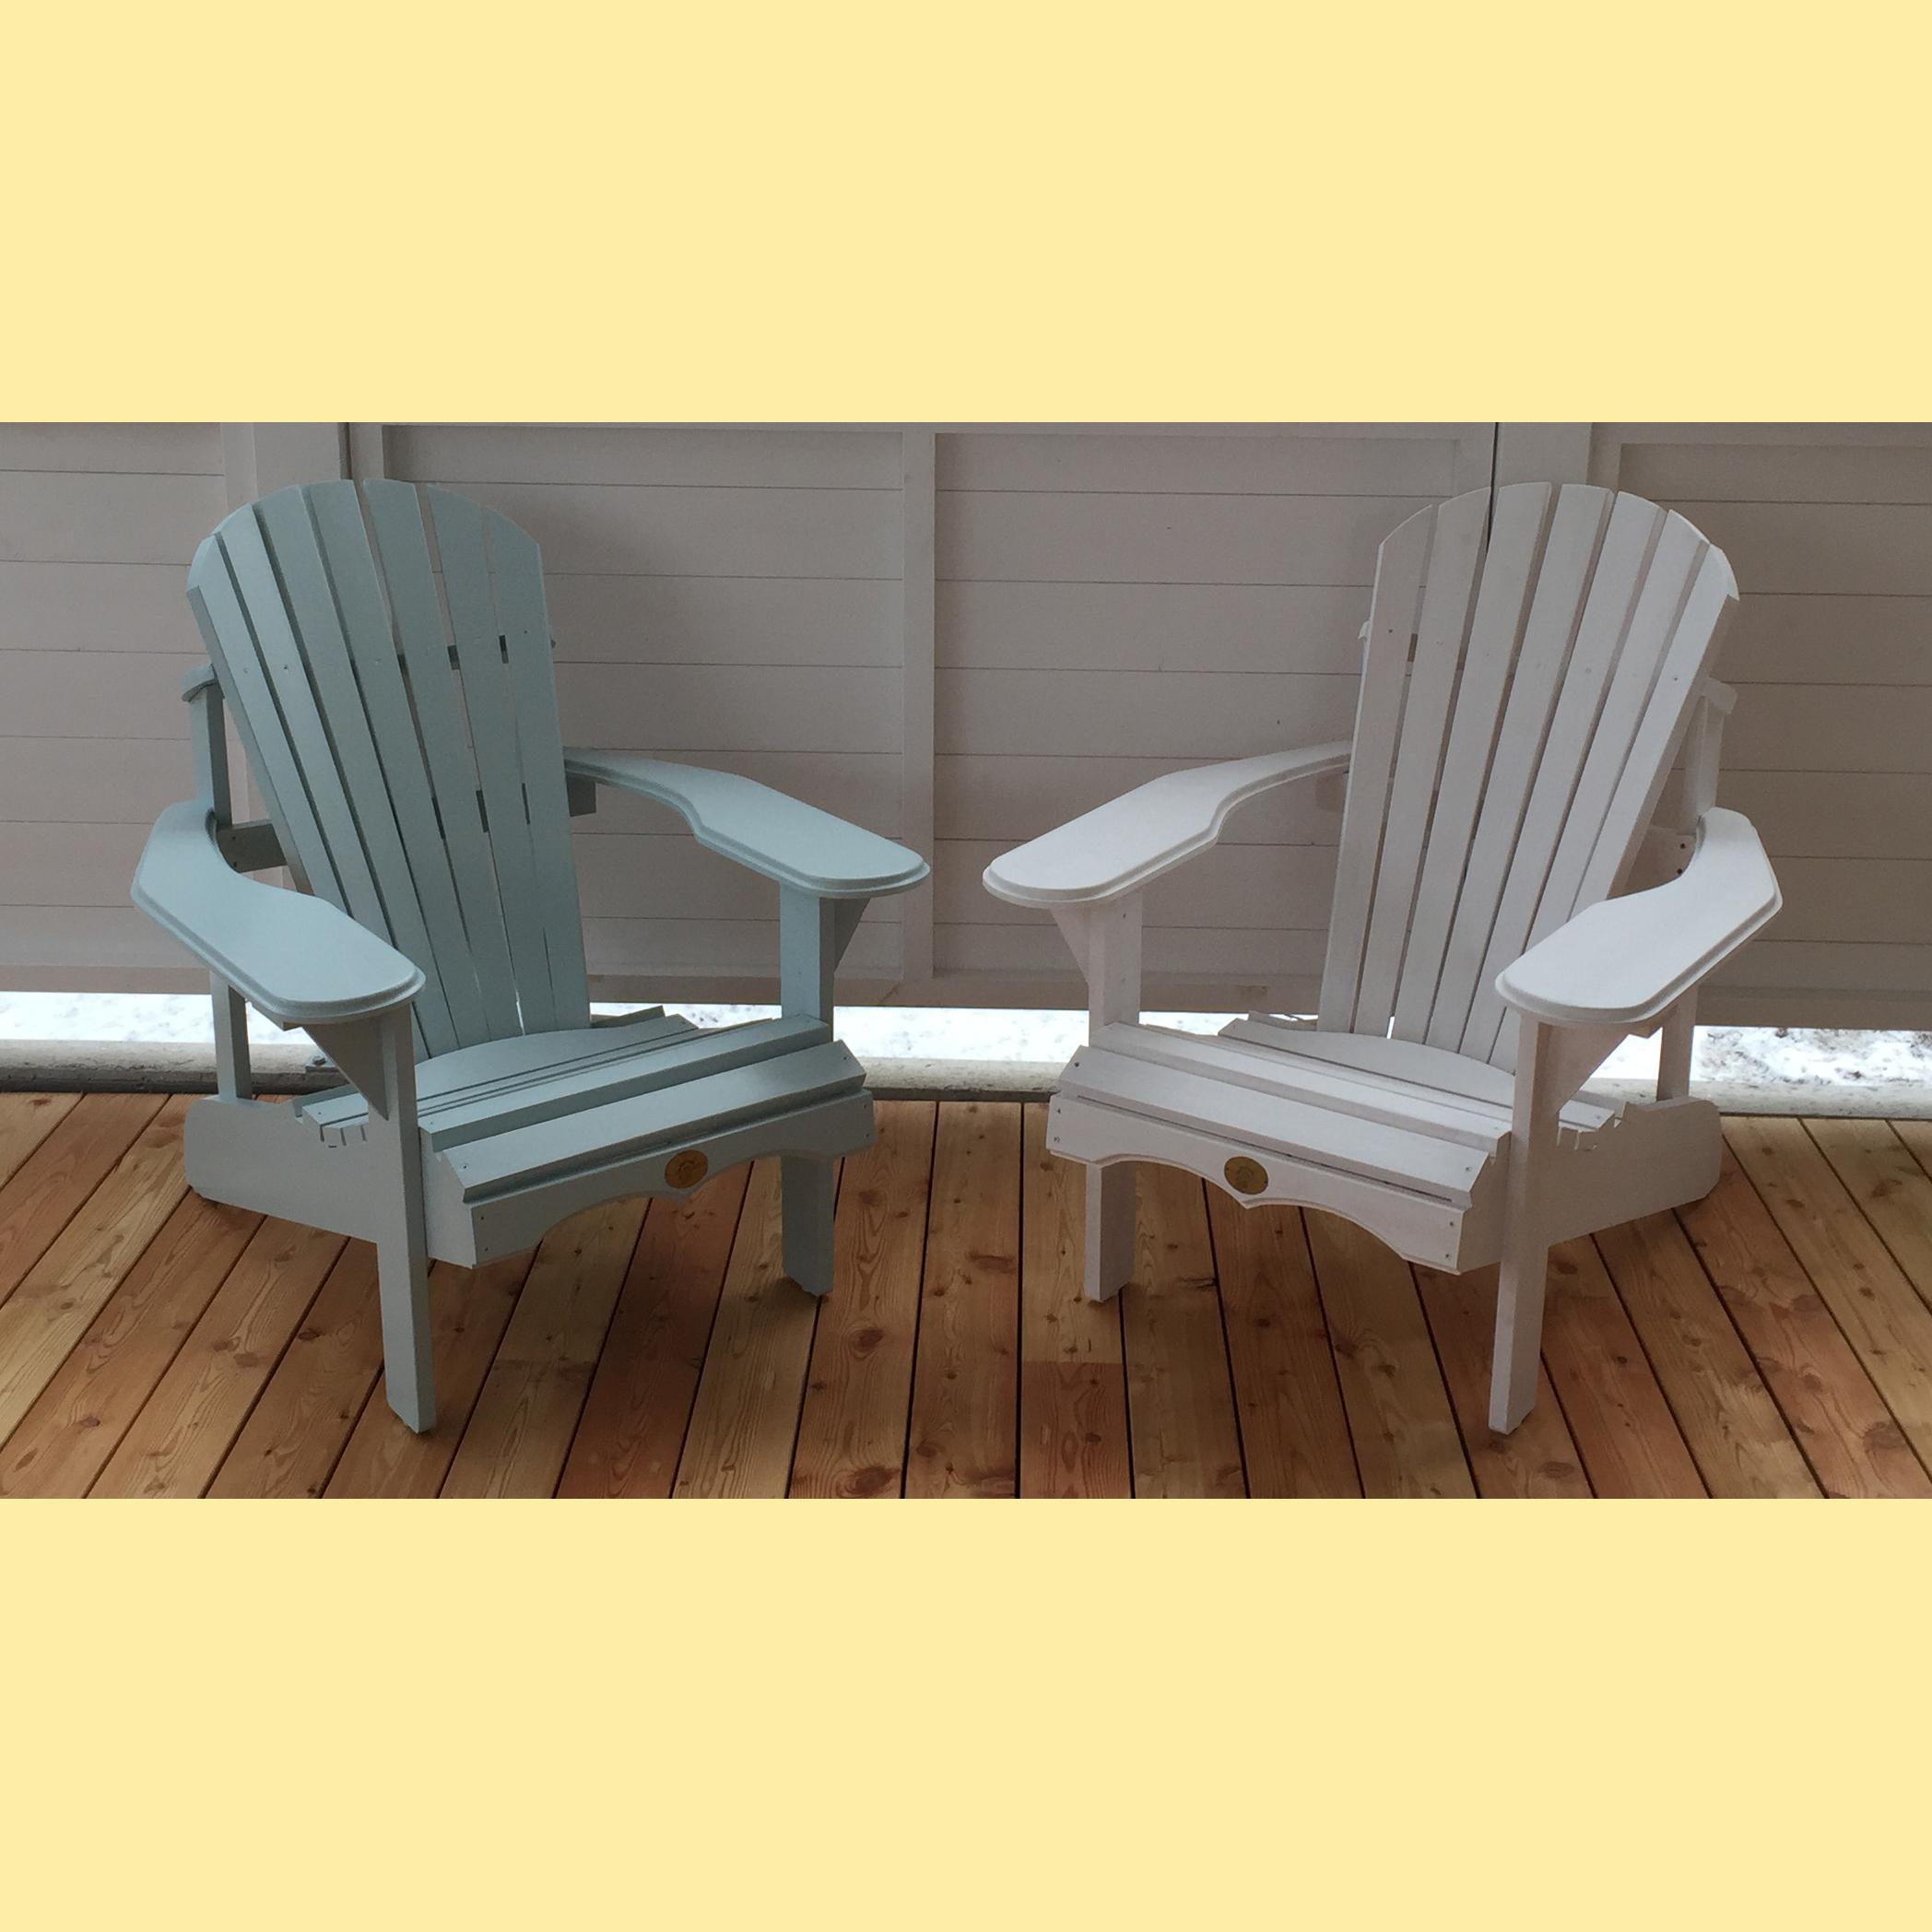 Adirondack Bear Chair Pinienholz BC201P, Wimborne White und Teresa's Green (aus der Farbpalette von Farrow and Ball) - 2er Frühlings-Aktion